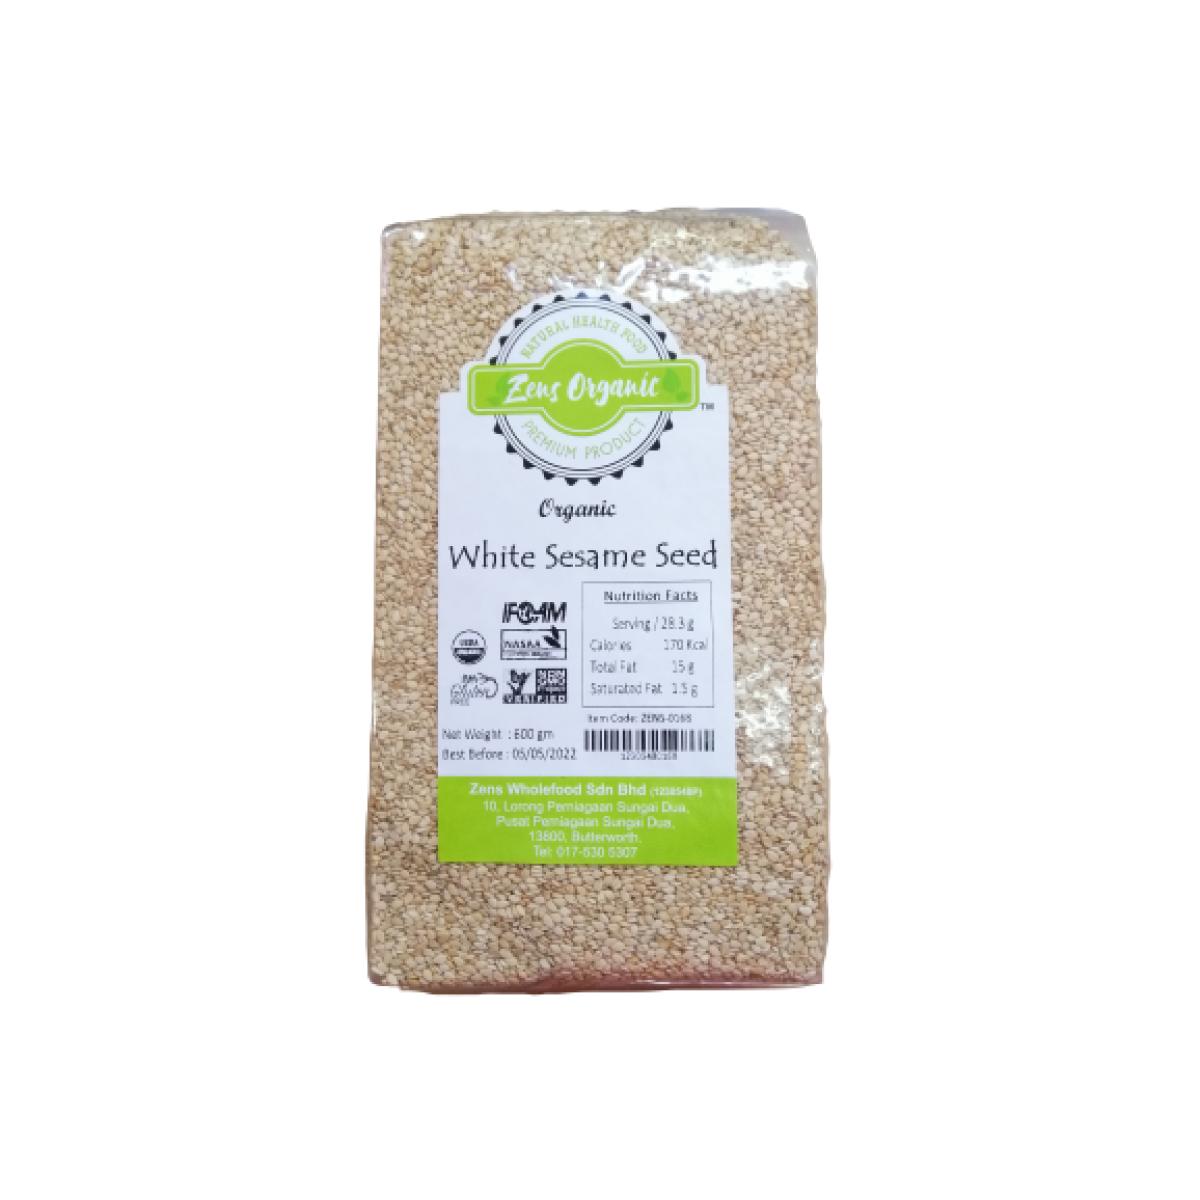 Zens Organic White Sesame Seed 600g